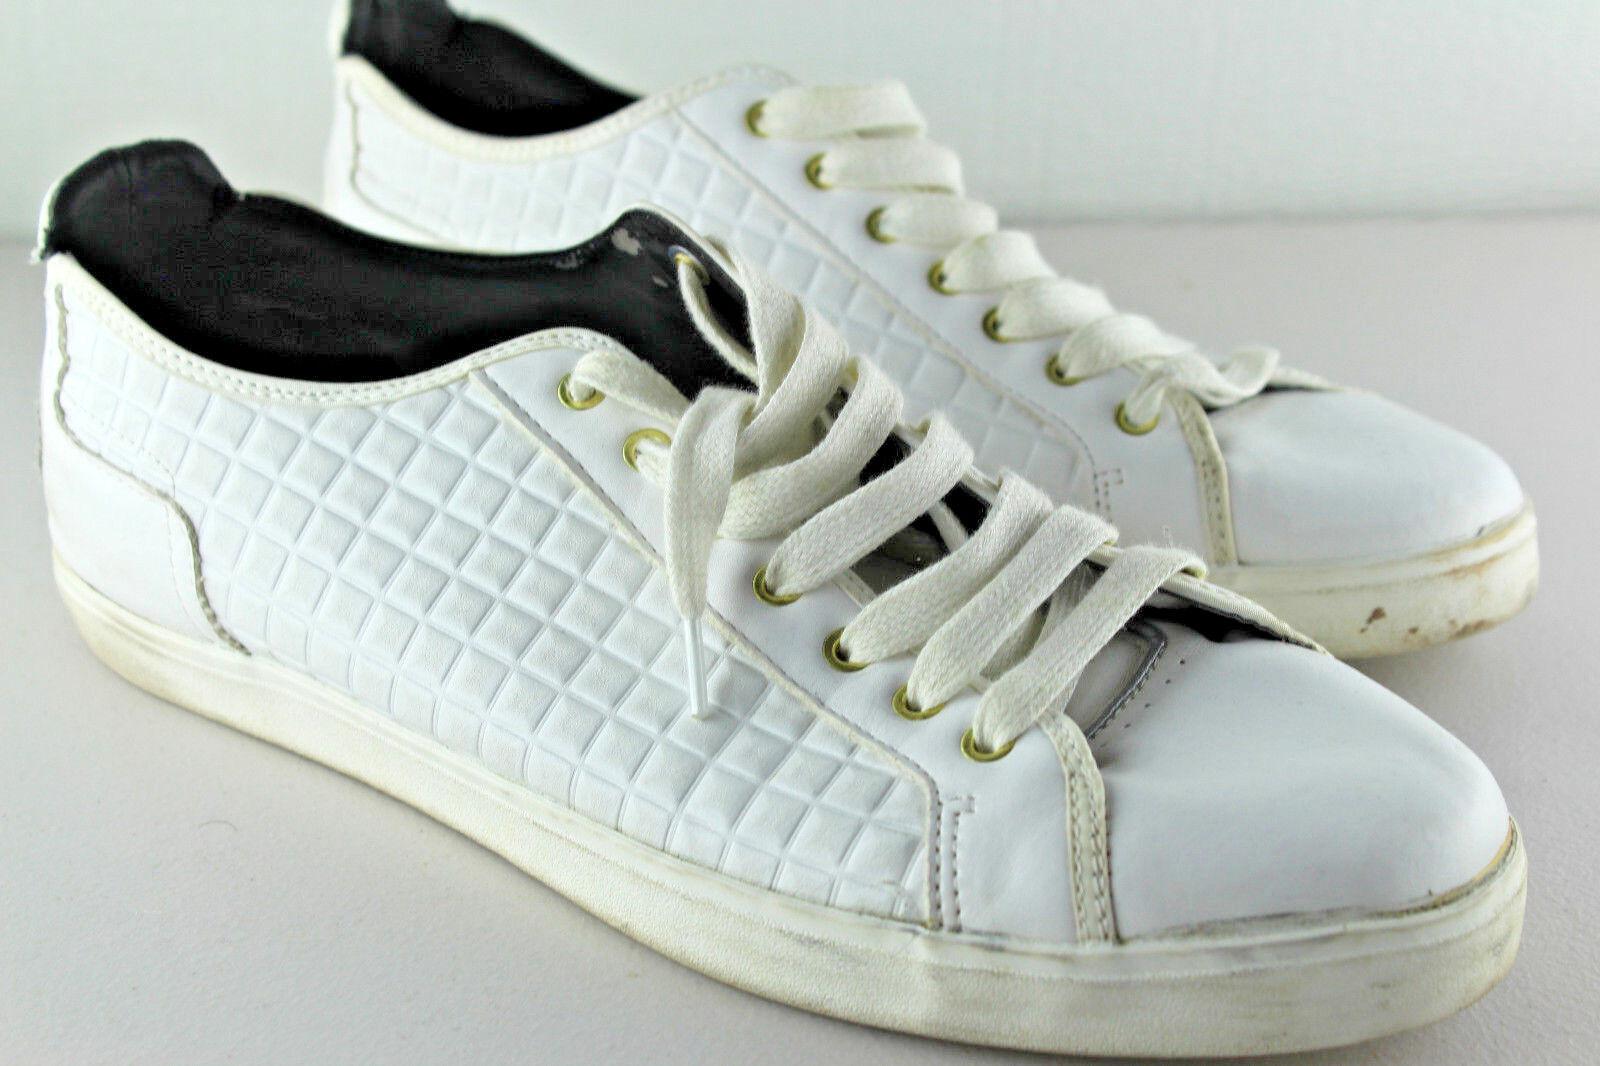 moda ZARA ZARA ZARA Uomo bianca Quilted Leather Trainer scarpe da ginnastica Portugal Sz EU 45 US 12  esclusivo